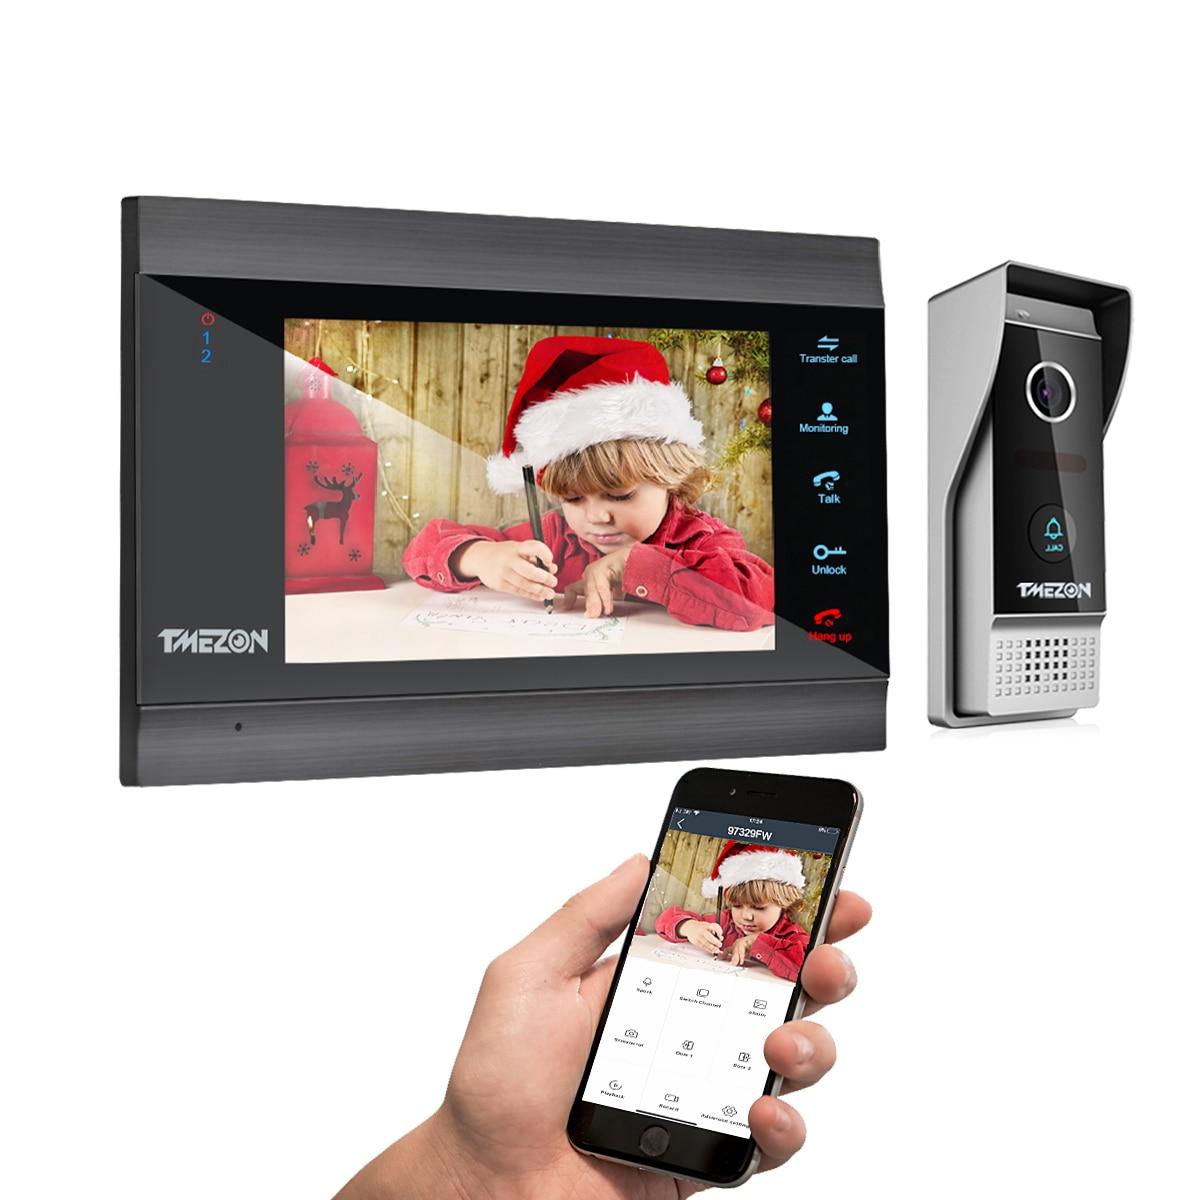 【NEW TUYA】TMEZON 7 Inch 1080P Wireless/Wifi Smart IP Video Door Phone Intercom System Entry with 1x1200TVL Wired Door Camera